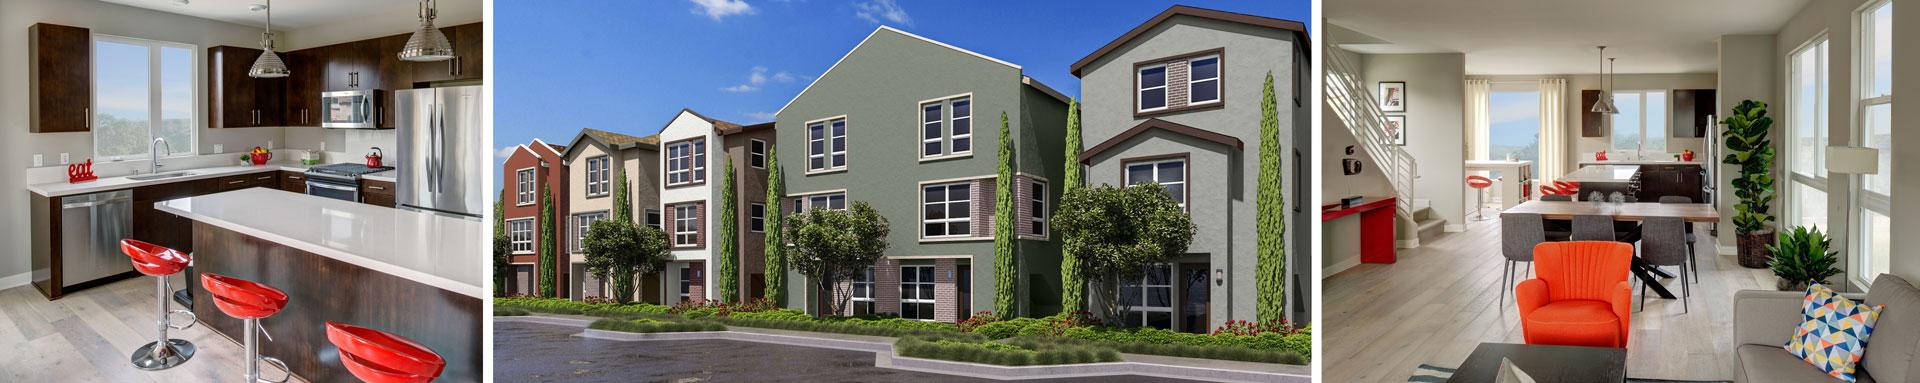 RP2_HomePg_Street-Interiors_8-17-17_1920x383_SFW-Hi